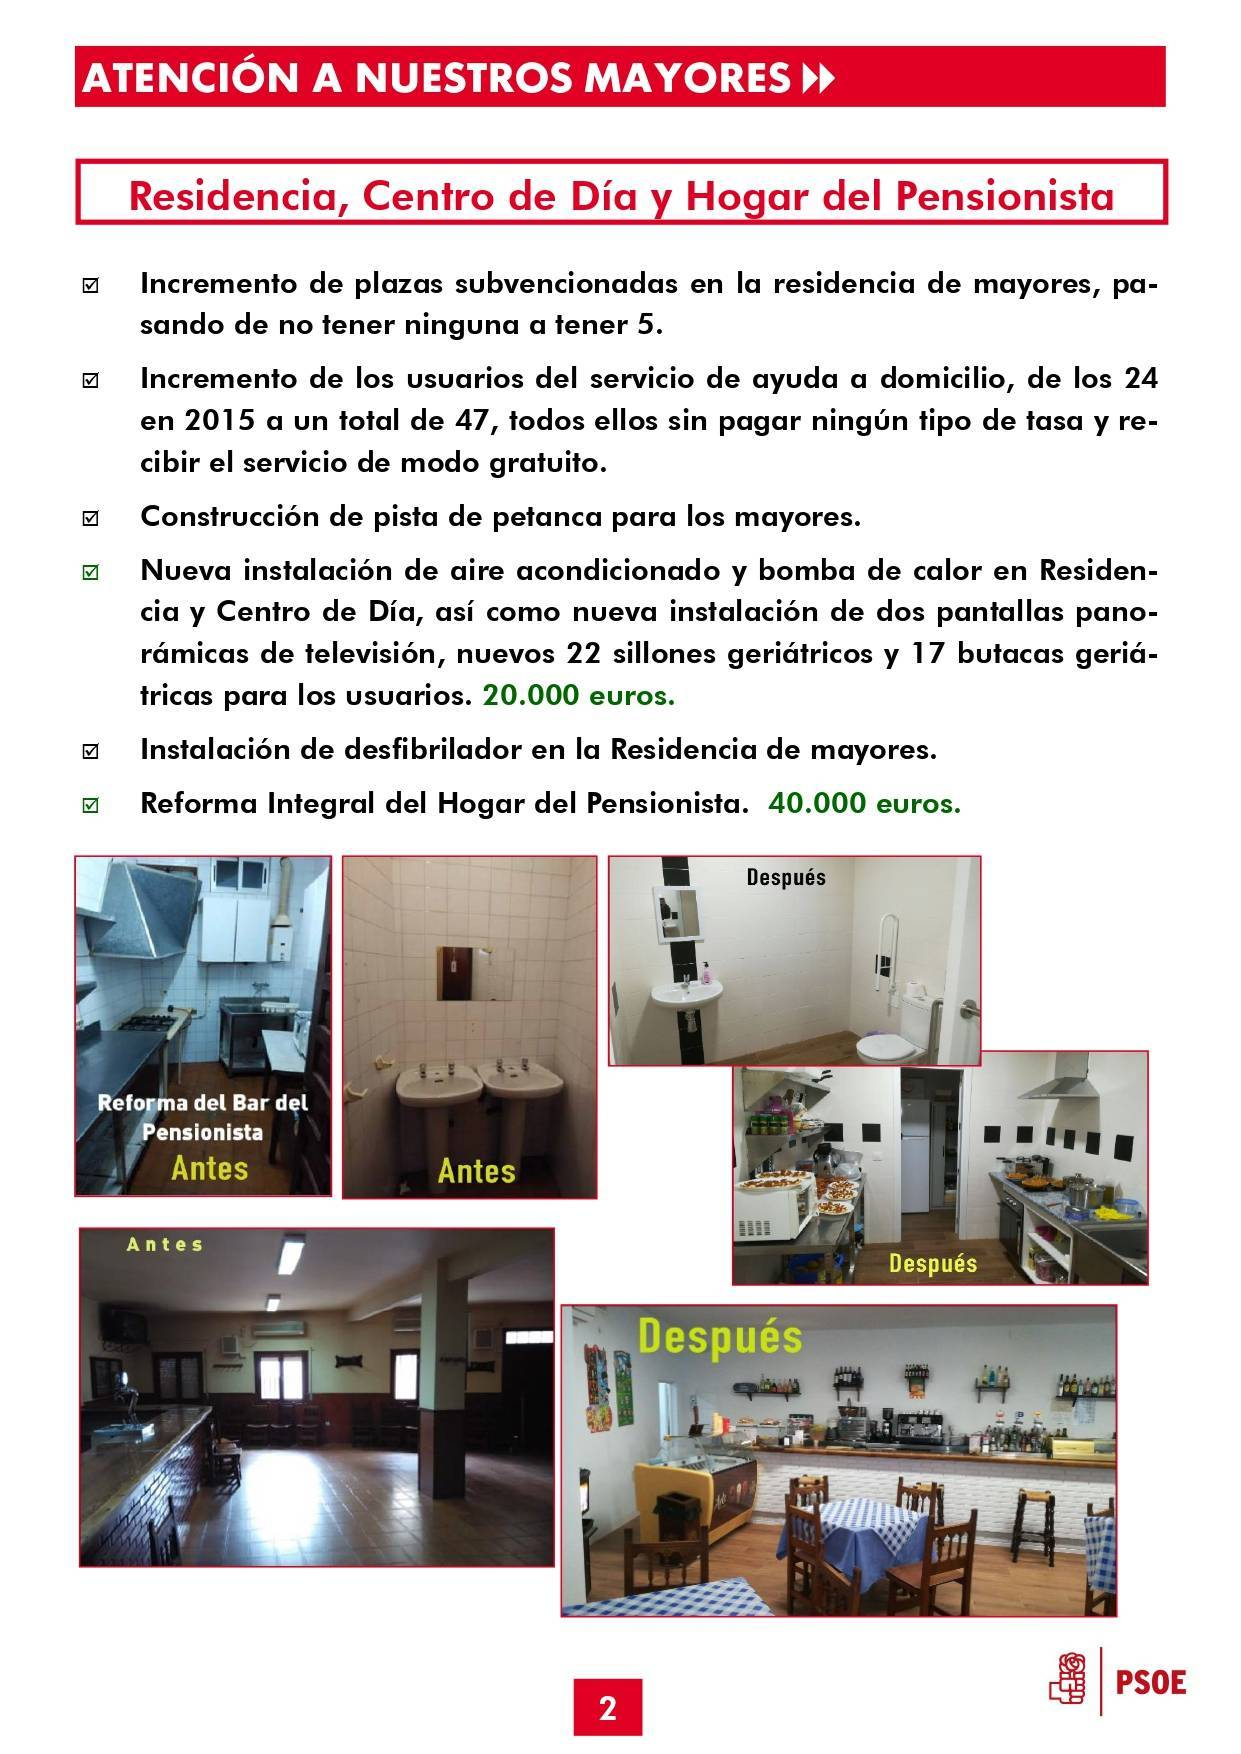 Boletín informativo de gestión municipal 2015-2019 - Guadalupe (Cáceres) 2